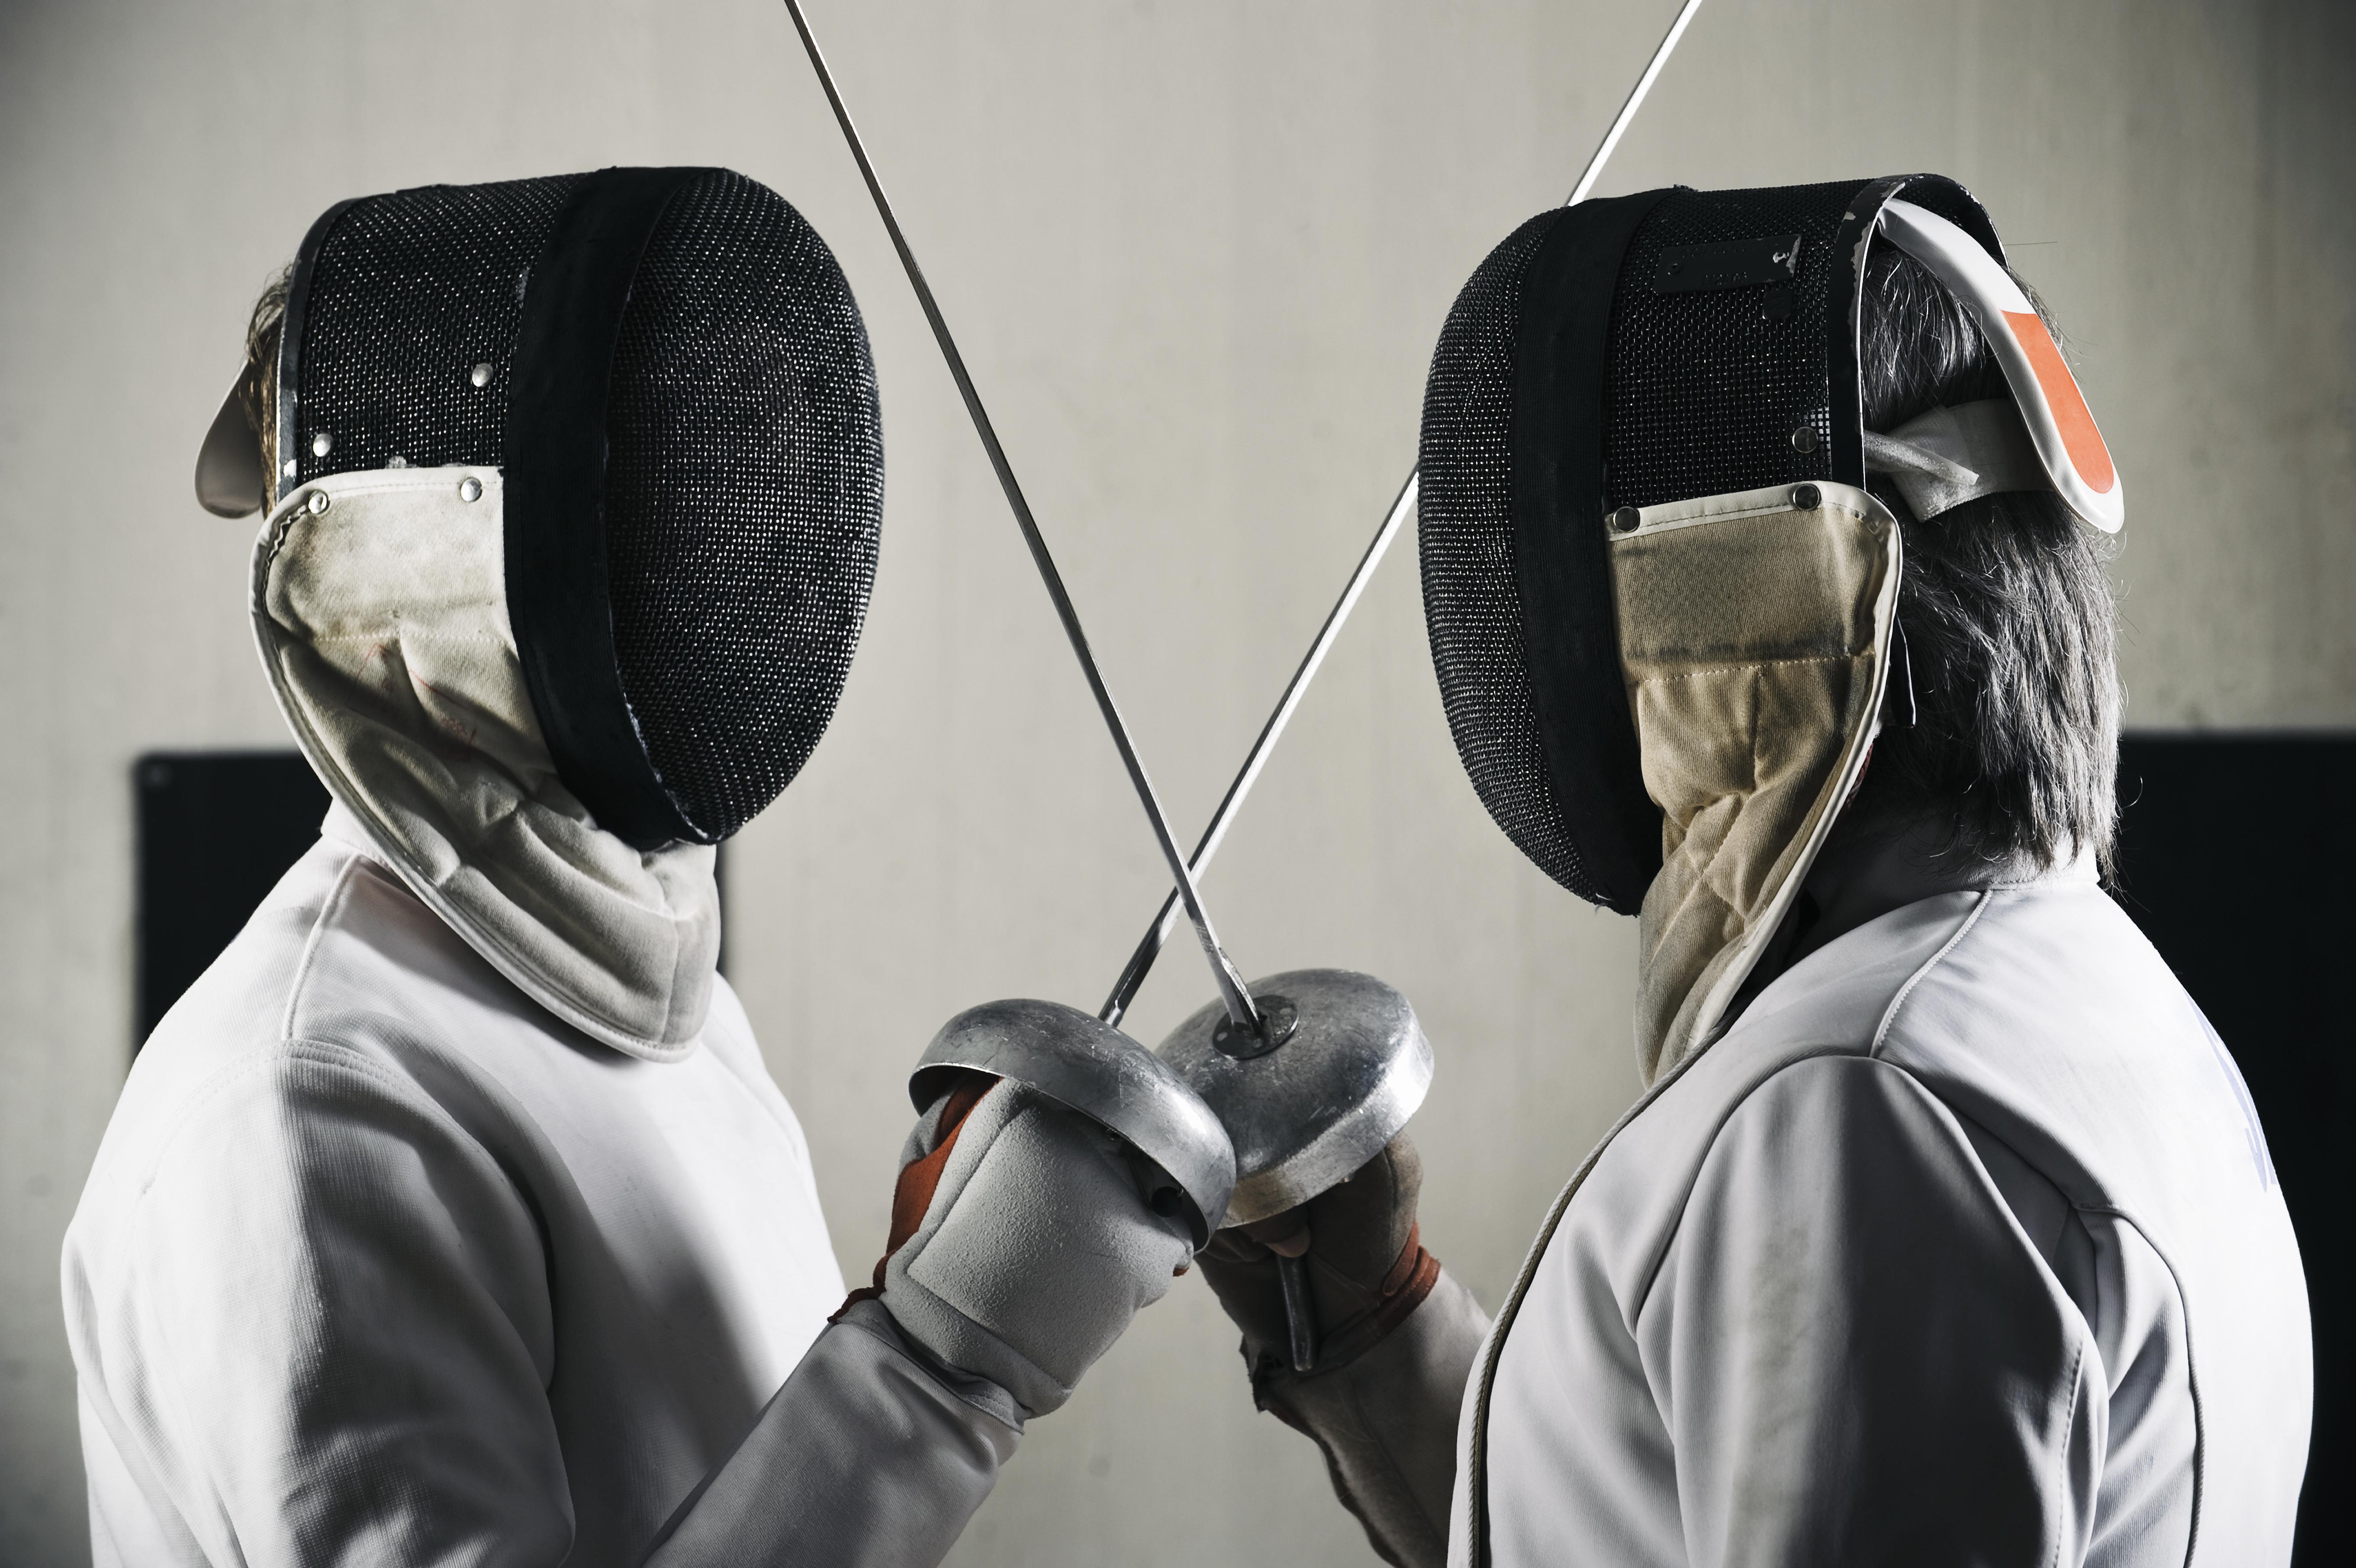 Dueling Fencers